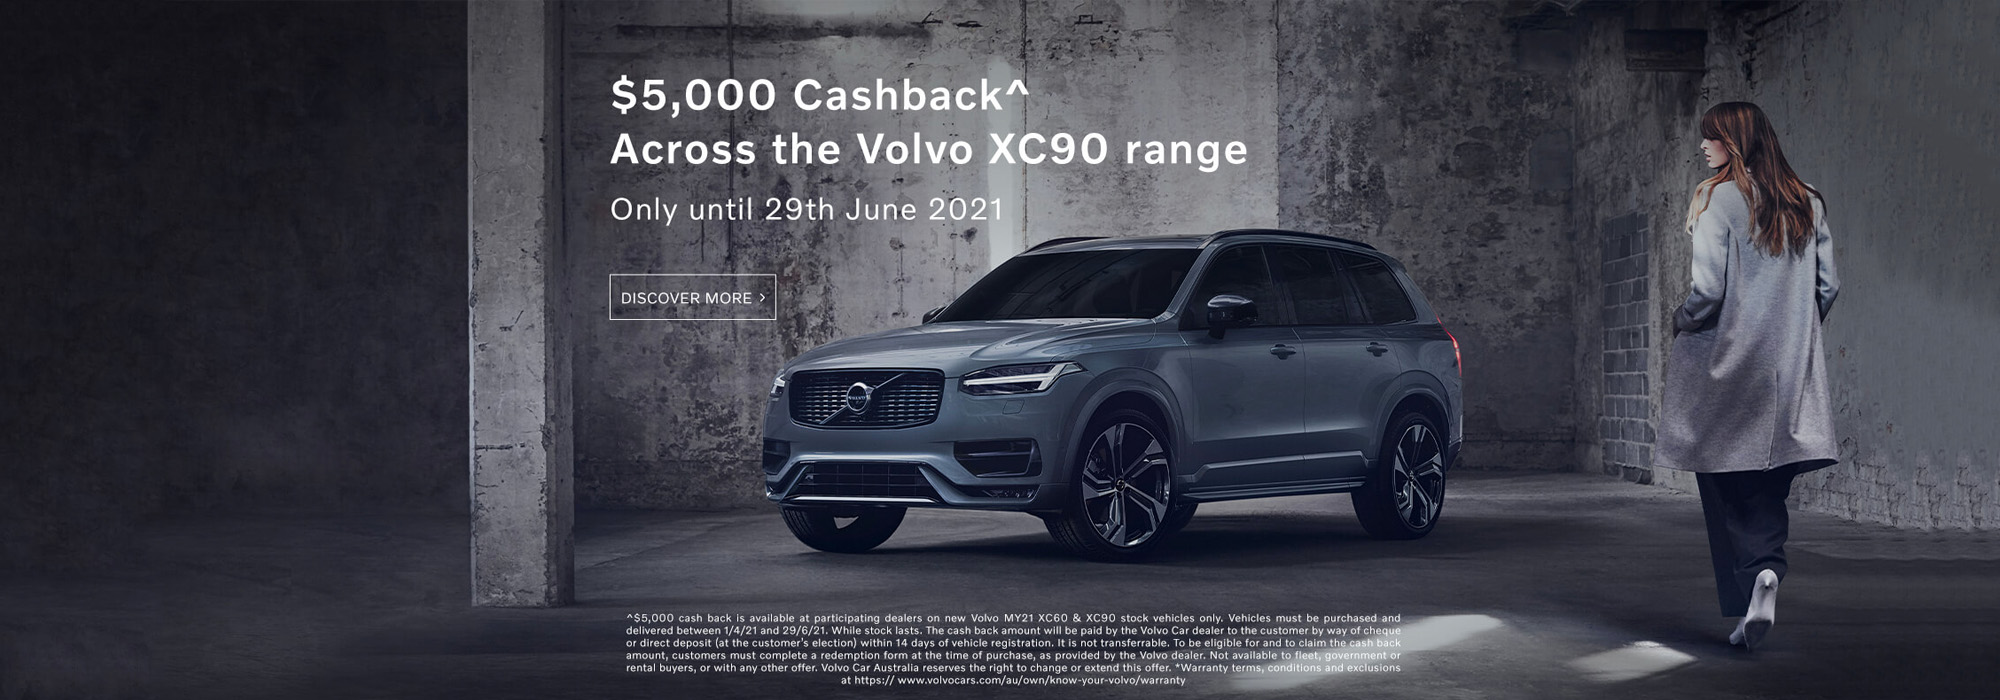 $5,000 Cashback across the XC90 range